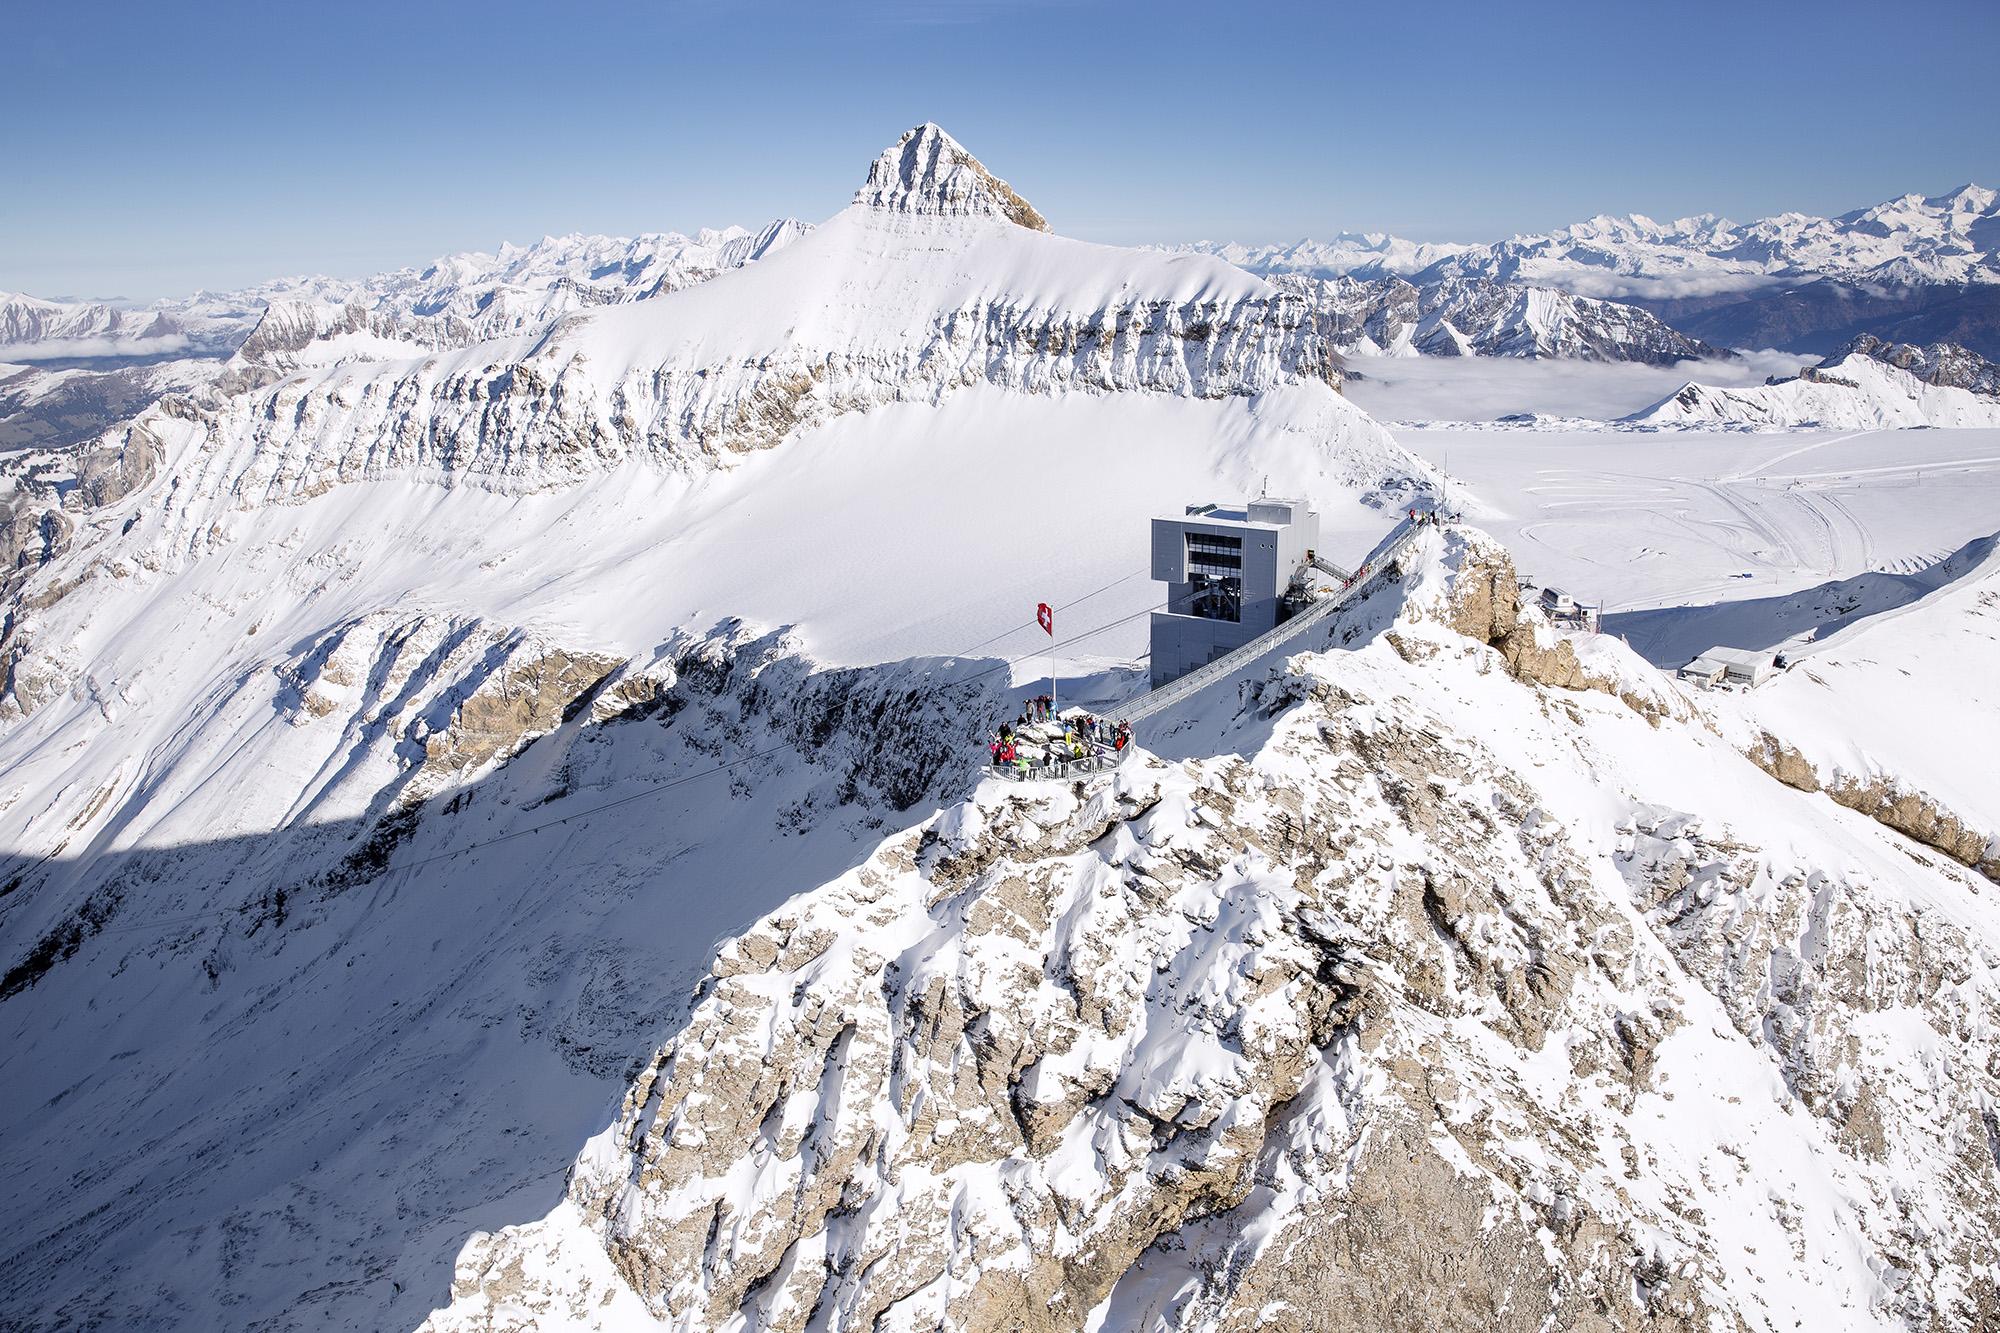 kt_2020_320_Keytours_excursions_Swisstours_glacier3000_peak_walk2_2048_10